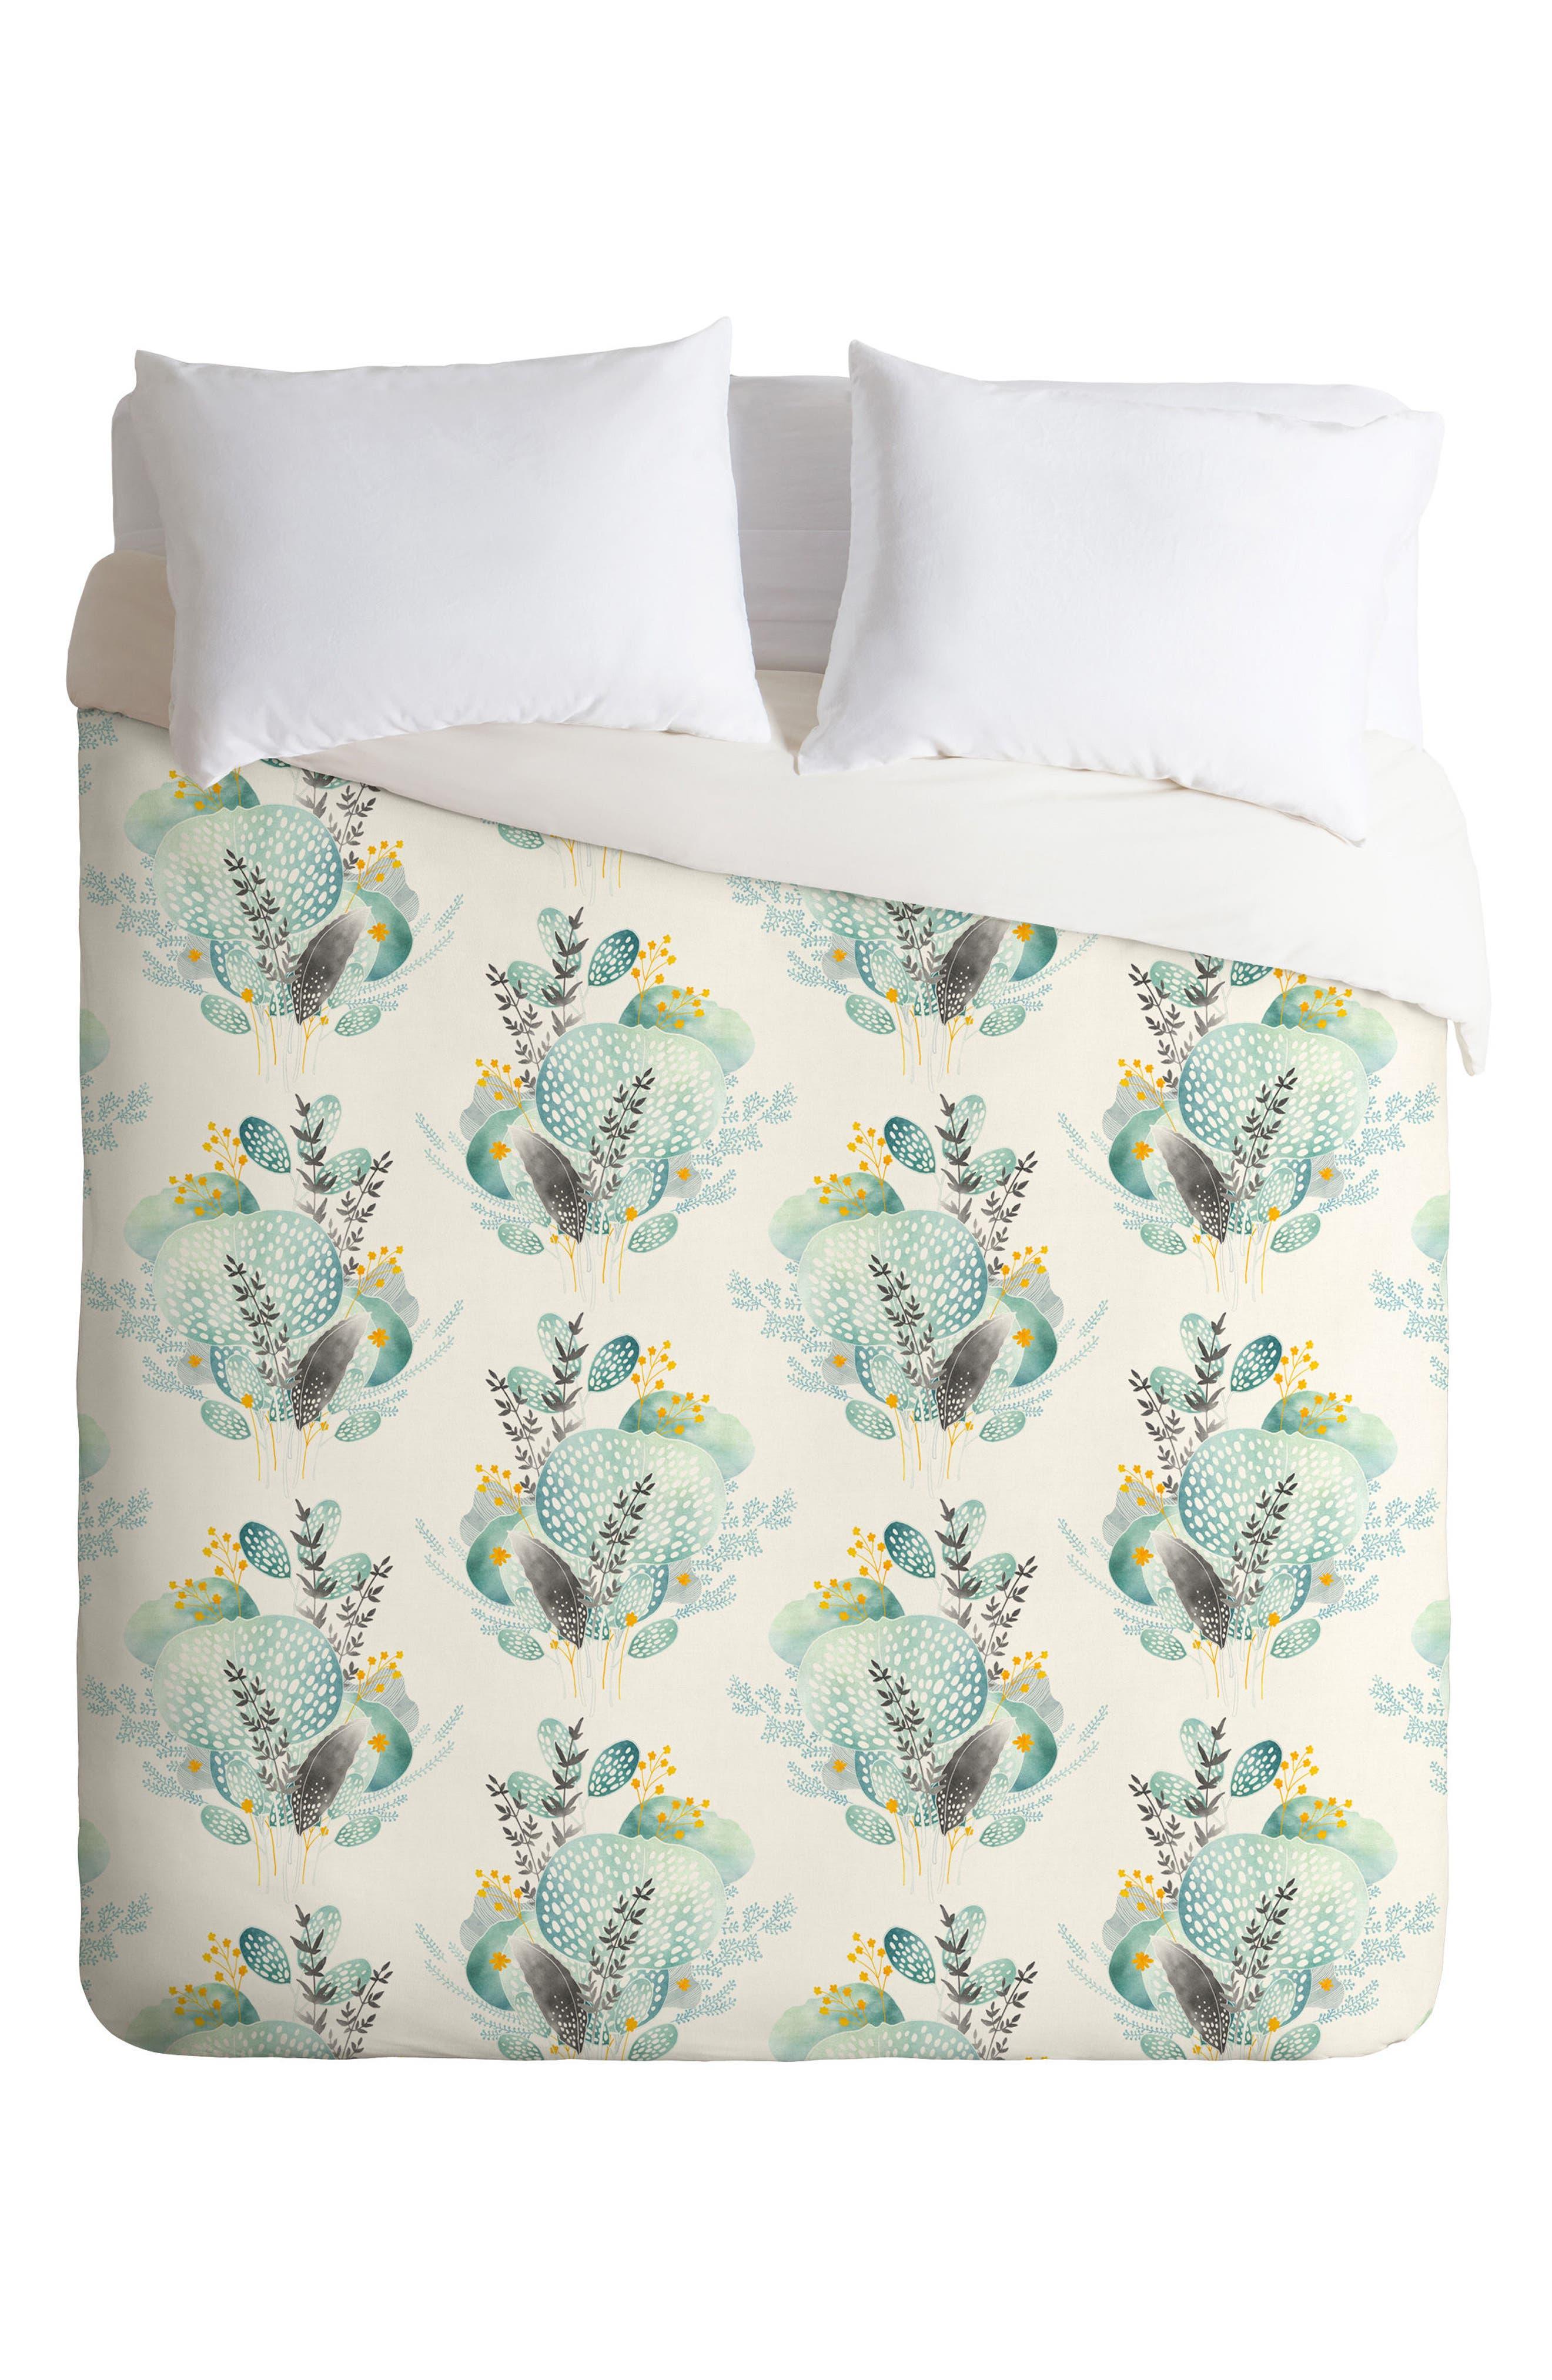 Seaflower Duvet Cover & Sham Set,                             Main thumbnail 1, color,                             300